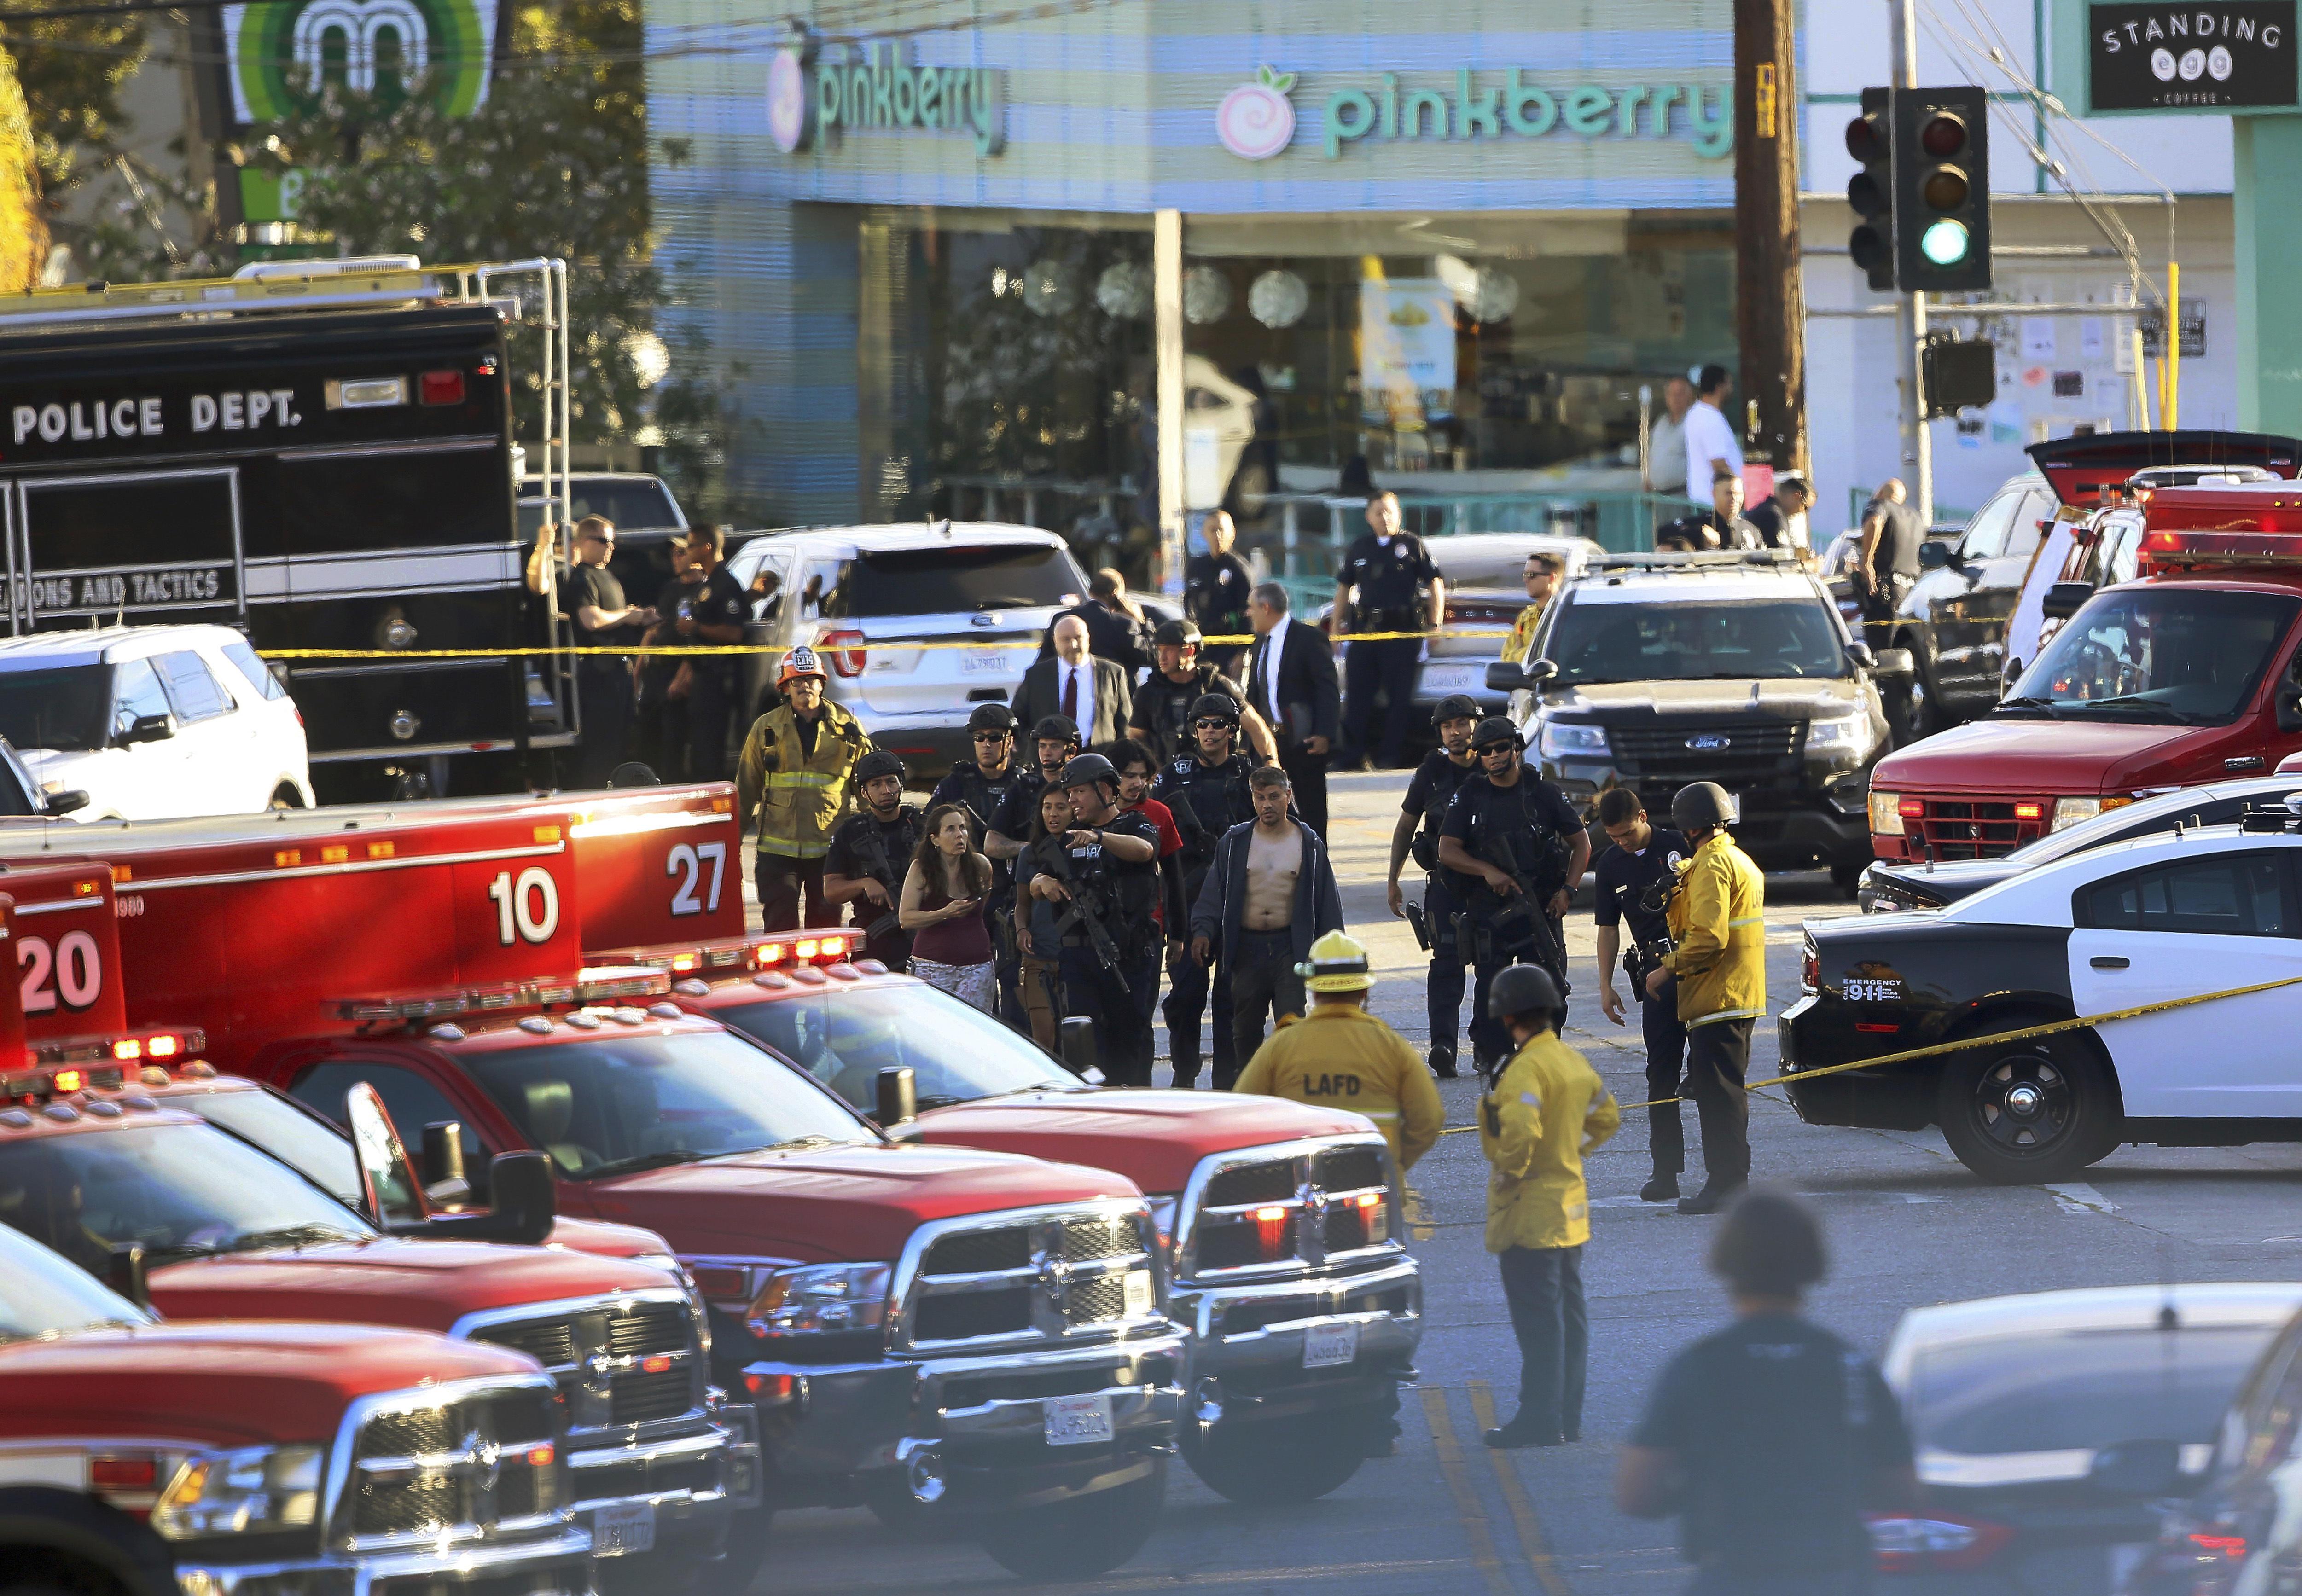 Trader Joe's shooting: 1 woman killed, suspect in custody at